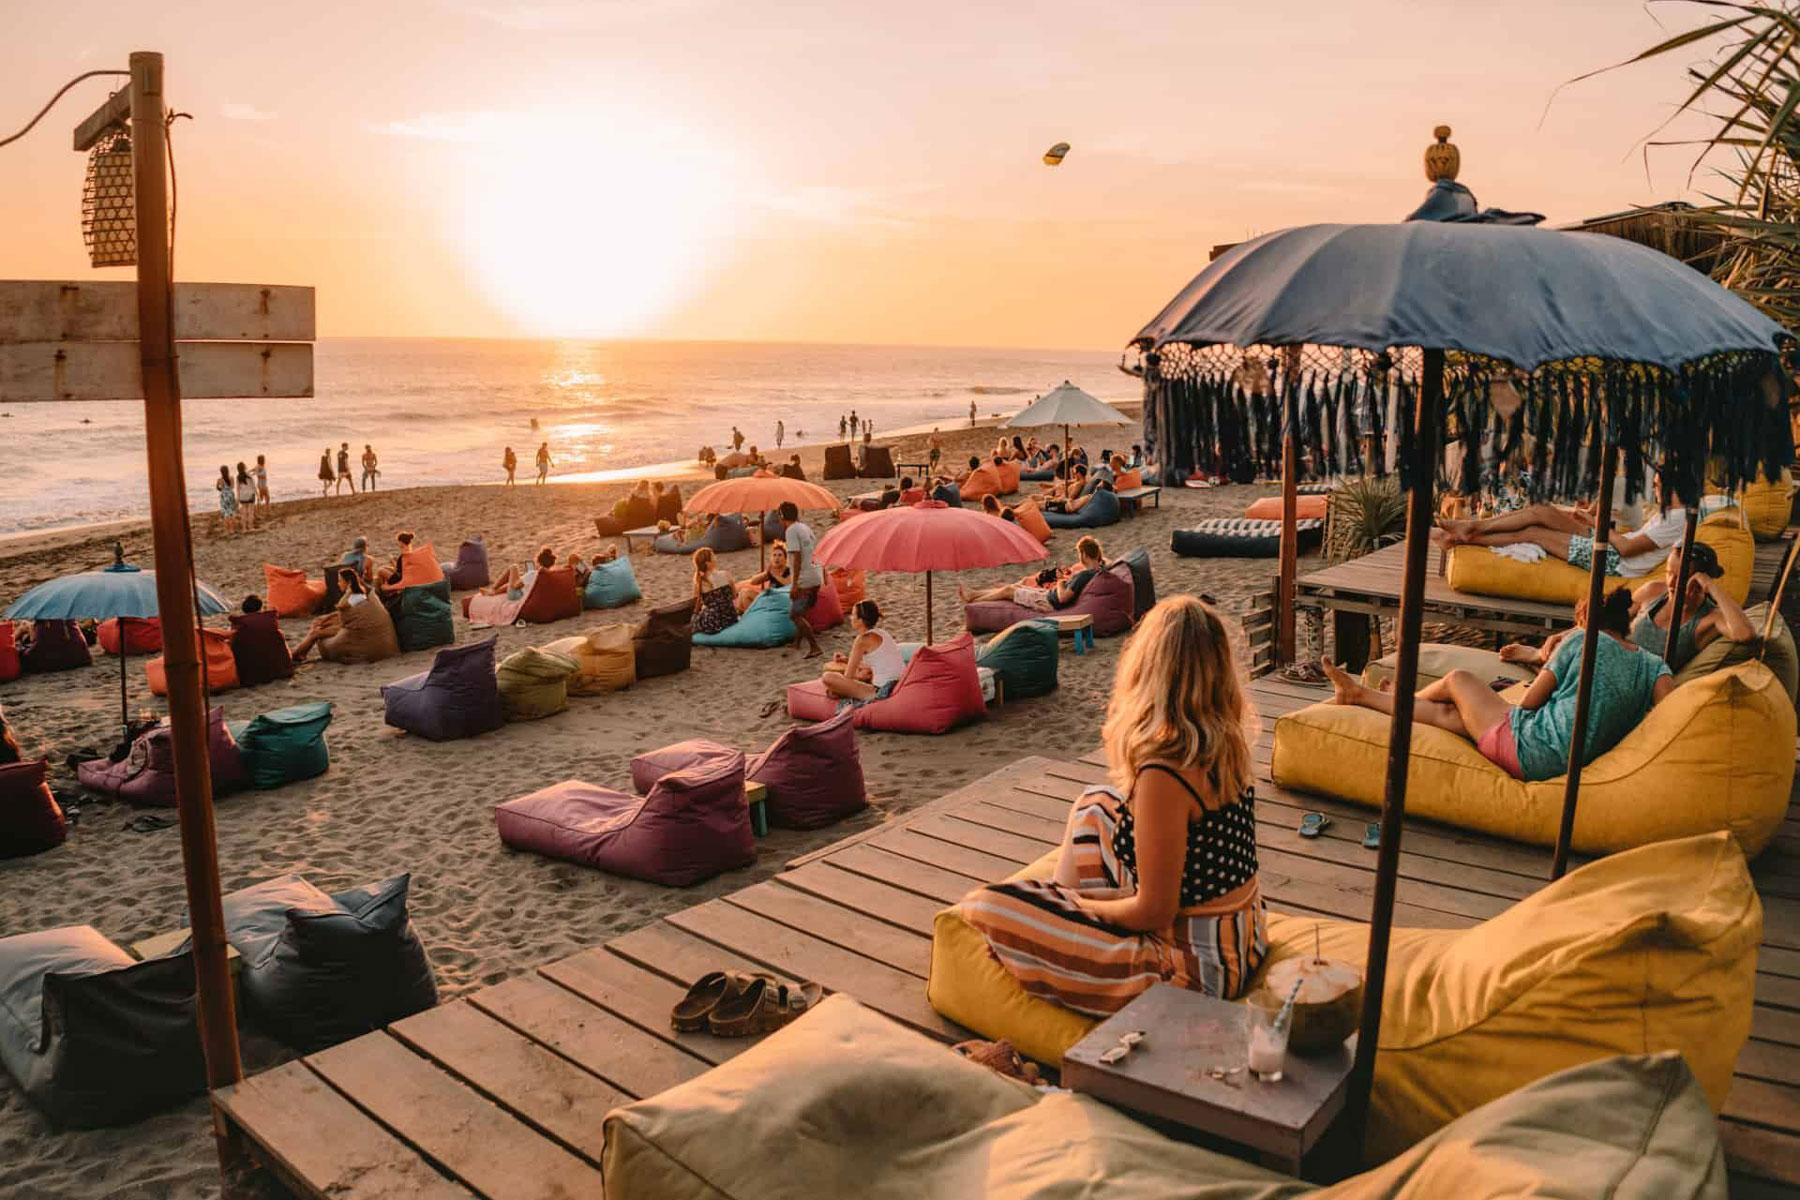 Bali Set To Crack Down Hard On Misbehaving Tourists